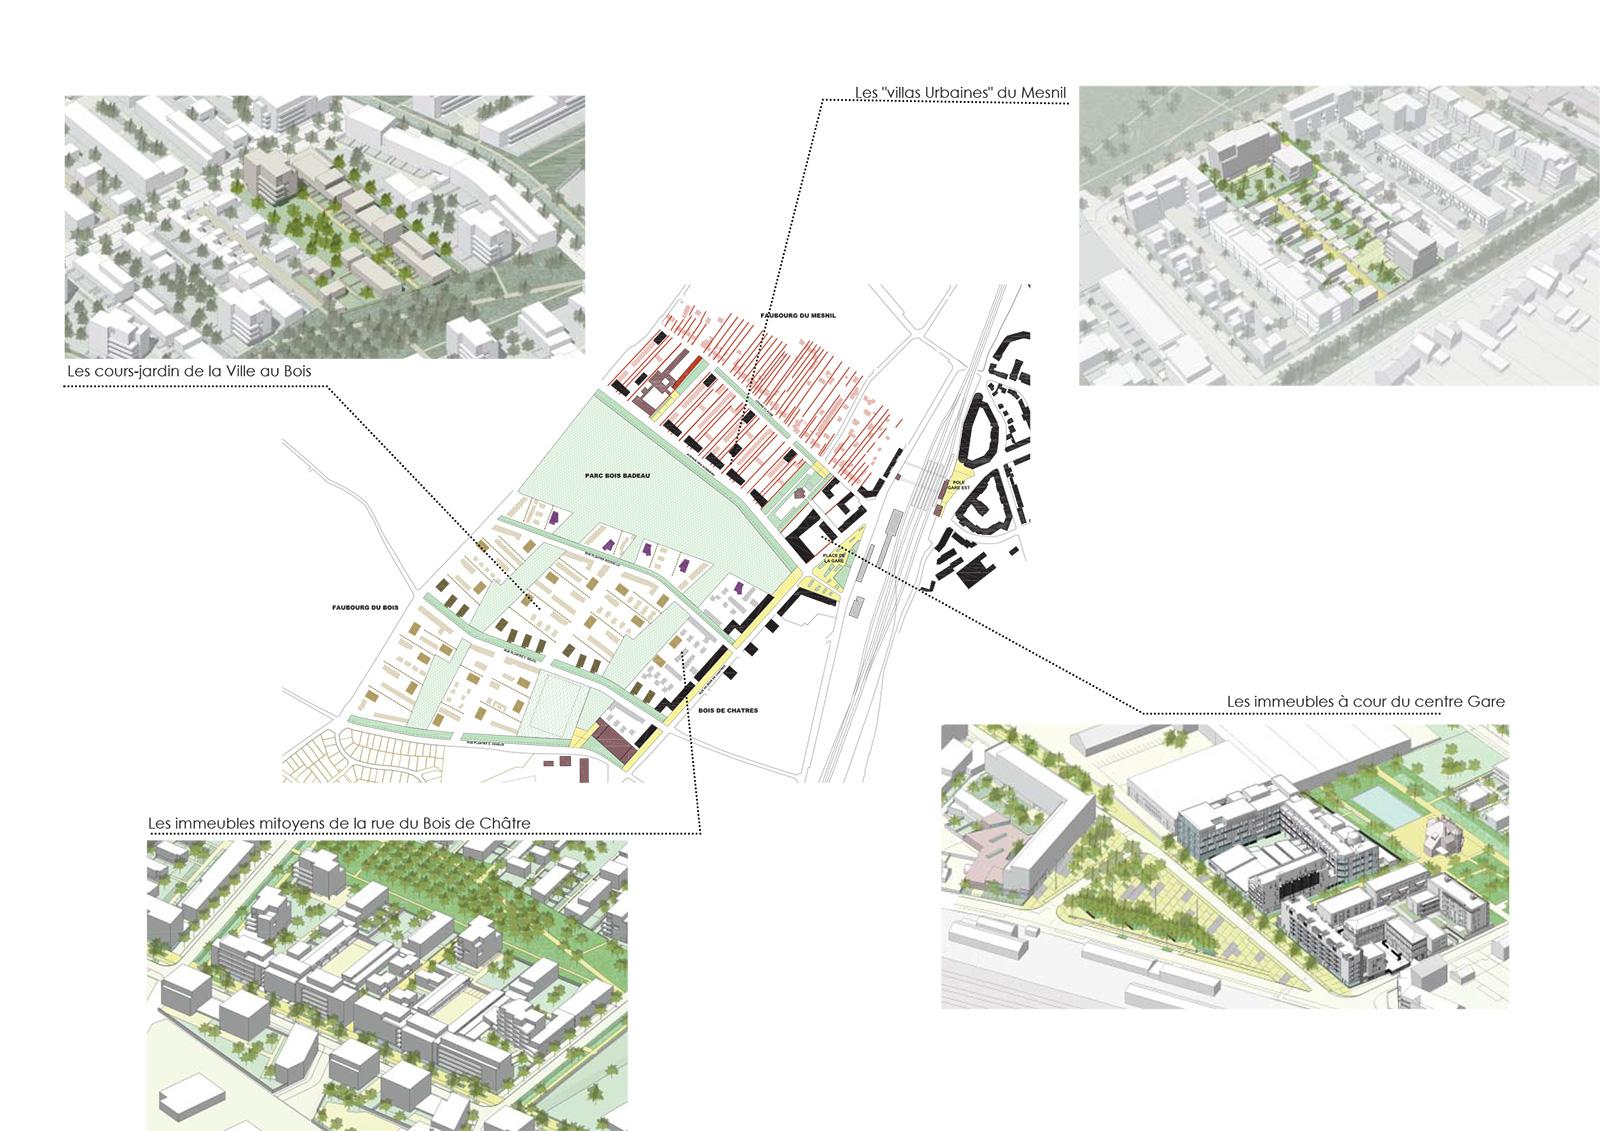 11-germe-et-jam-bretigny-clause-bois-badeau-projet-urbain--tissu